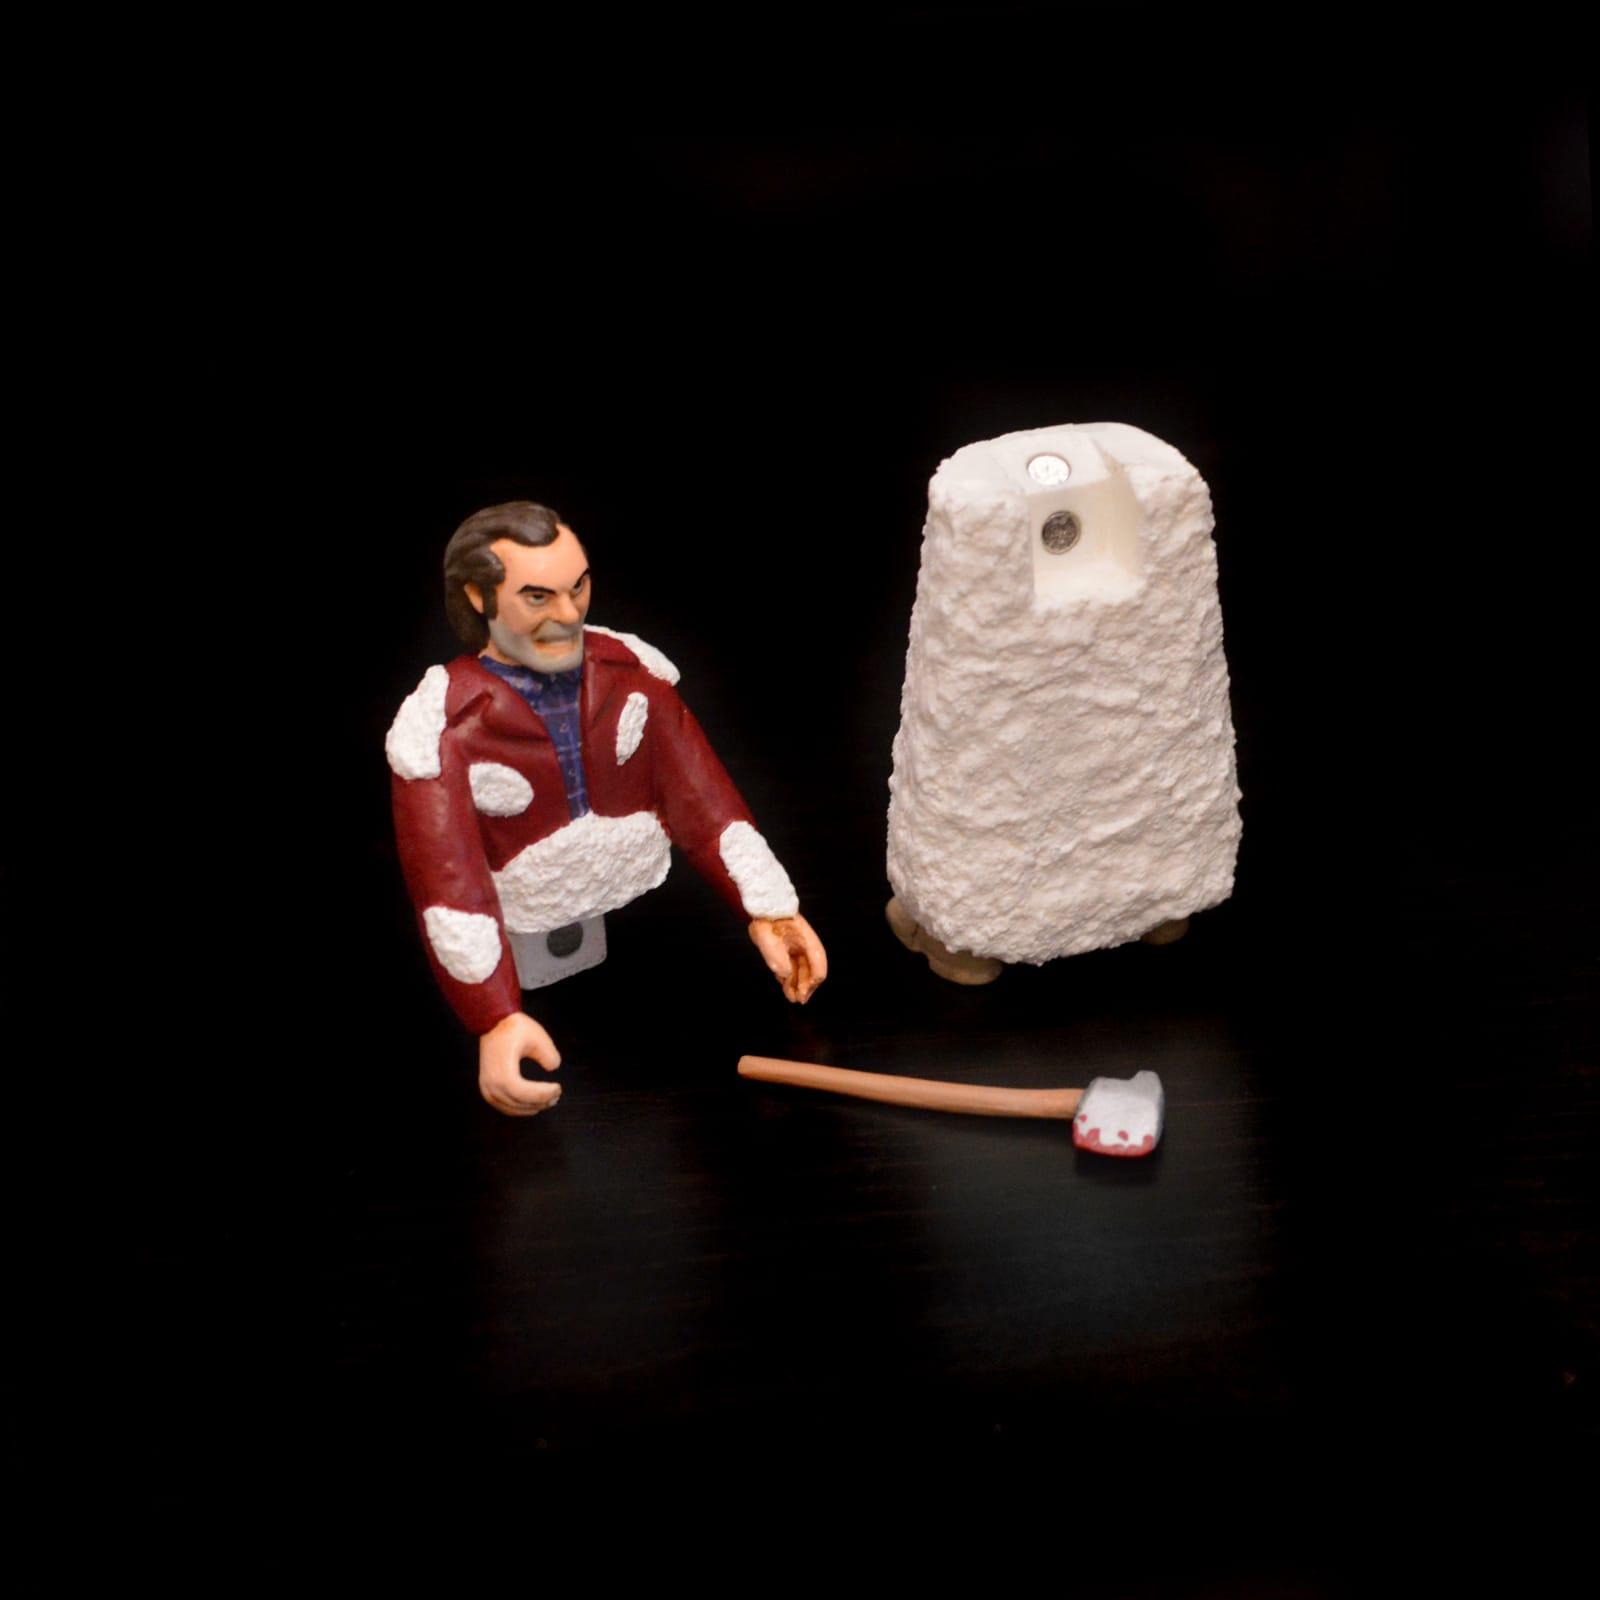 Frozen Jack The Shining Nastytheplastic Resin Toy Art Toy